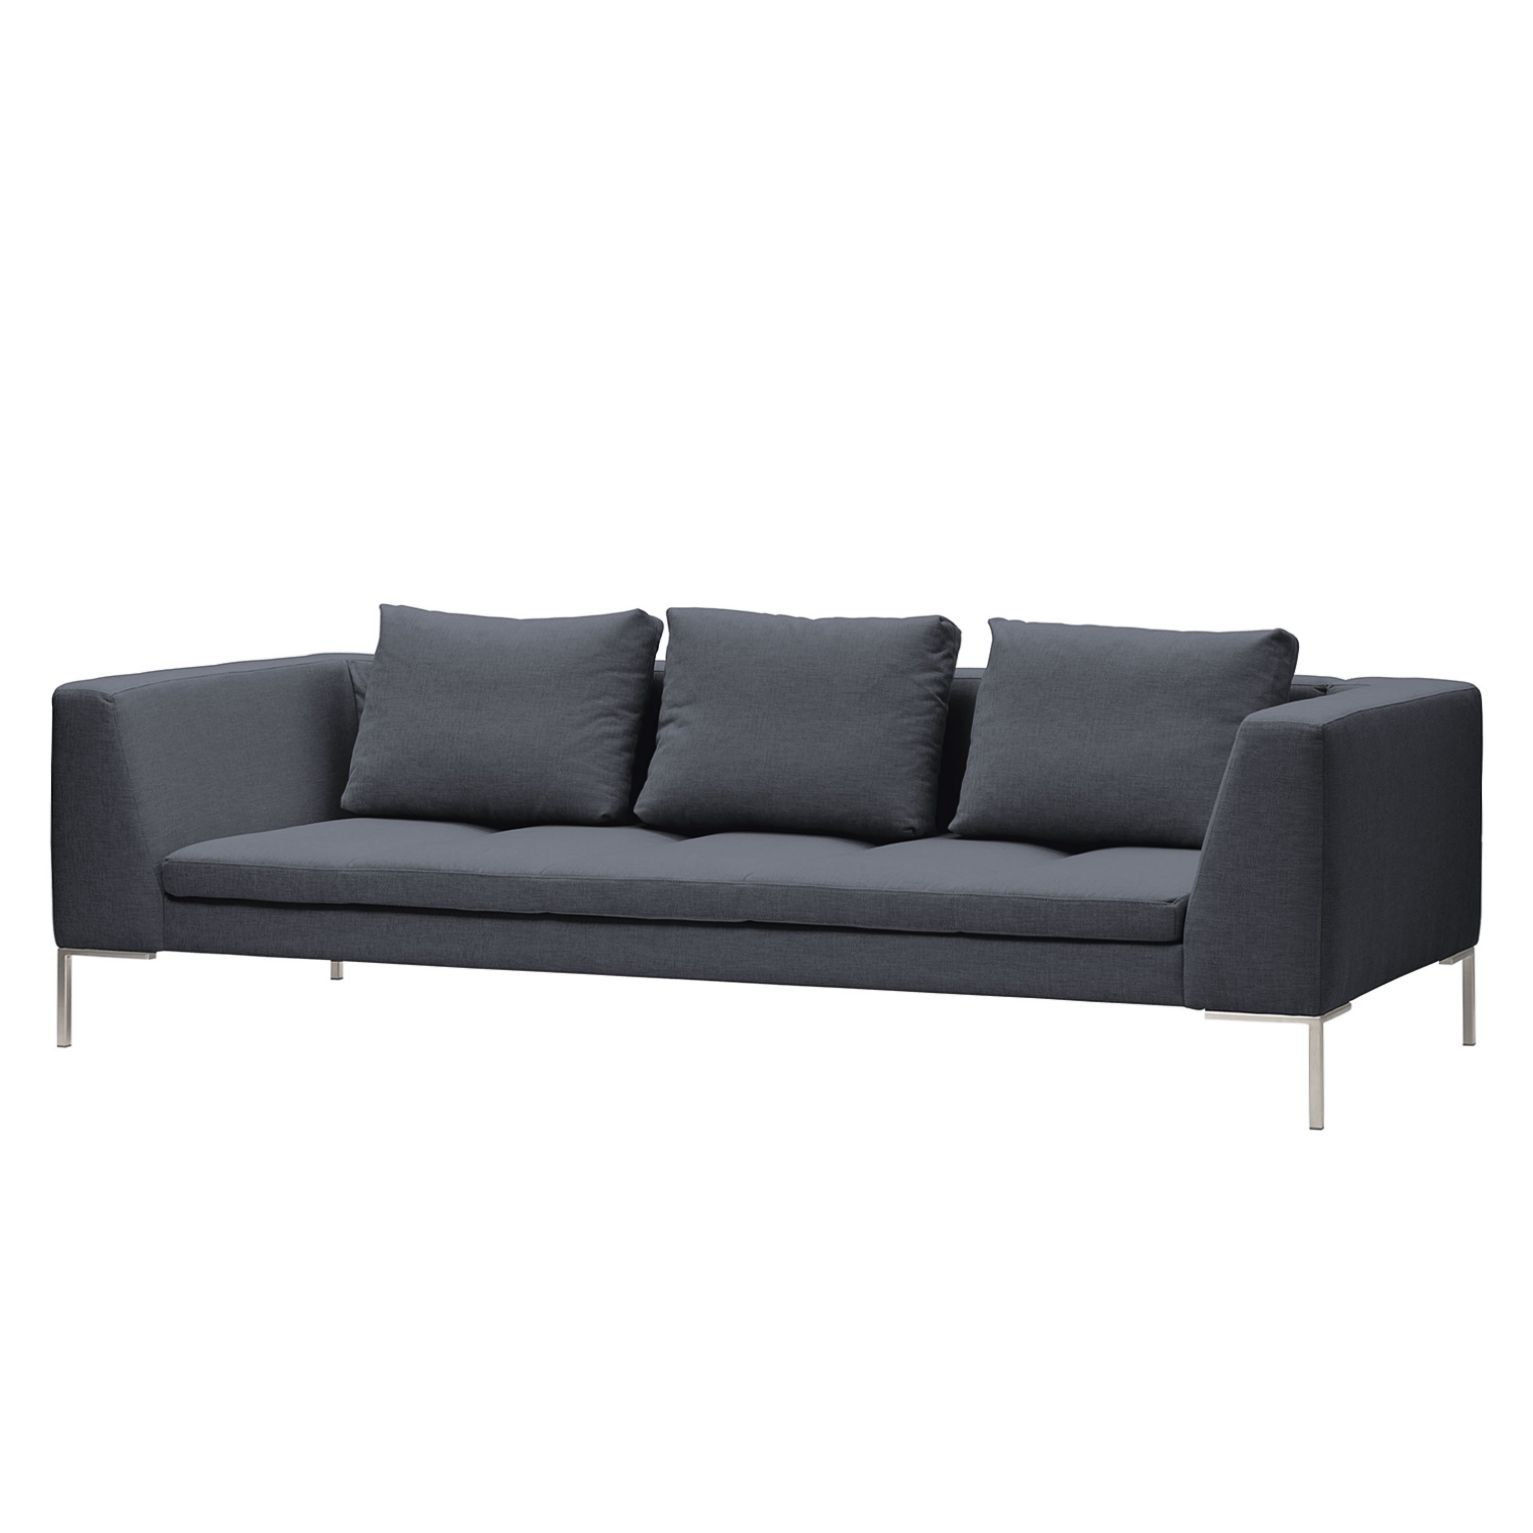 Sofa Madison (3-Sitzer) Webstoff - Stoff Milan Anthrazit